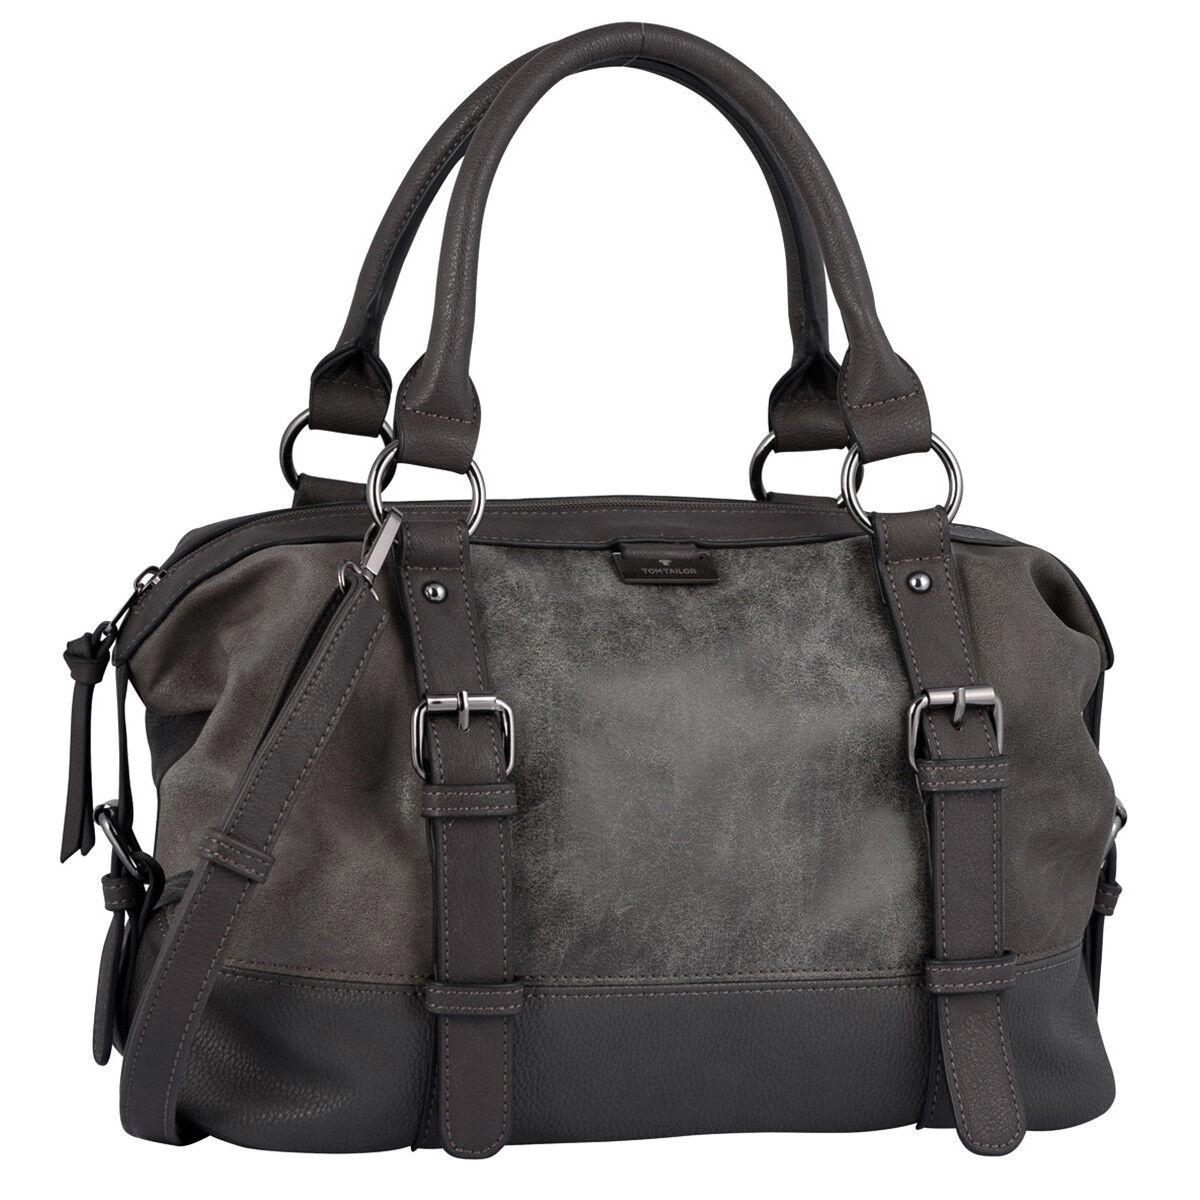 Tom Tailor Juna Bowling Bag Handtasche Schultertasche Henkeltasche 24418